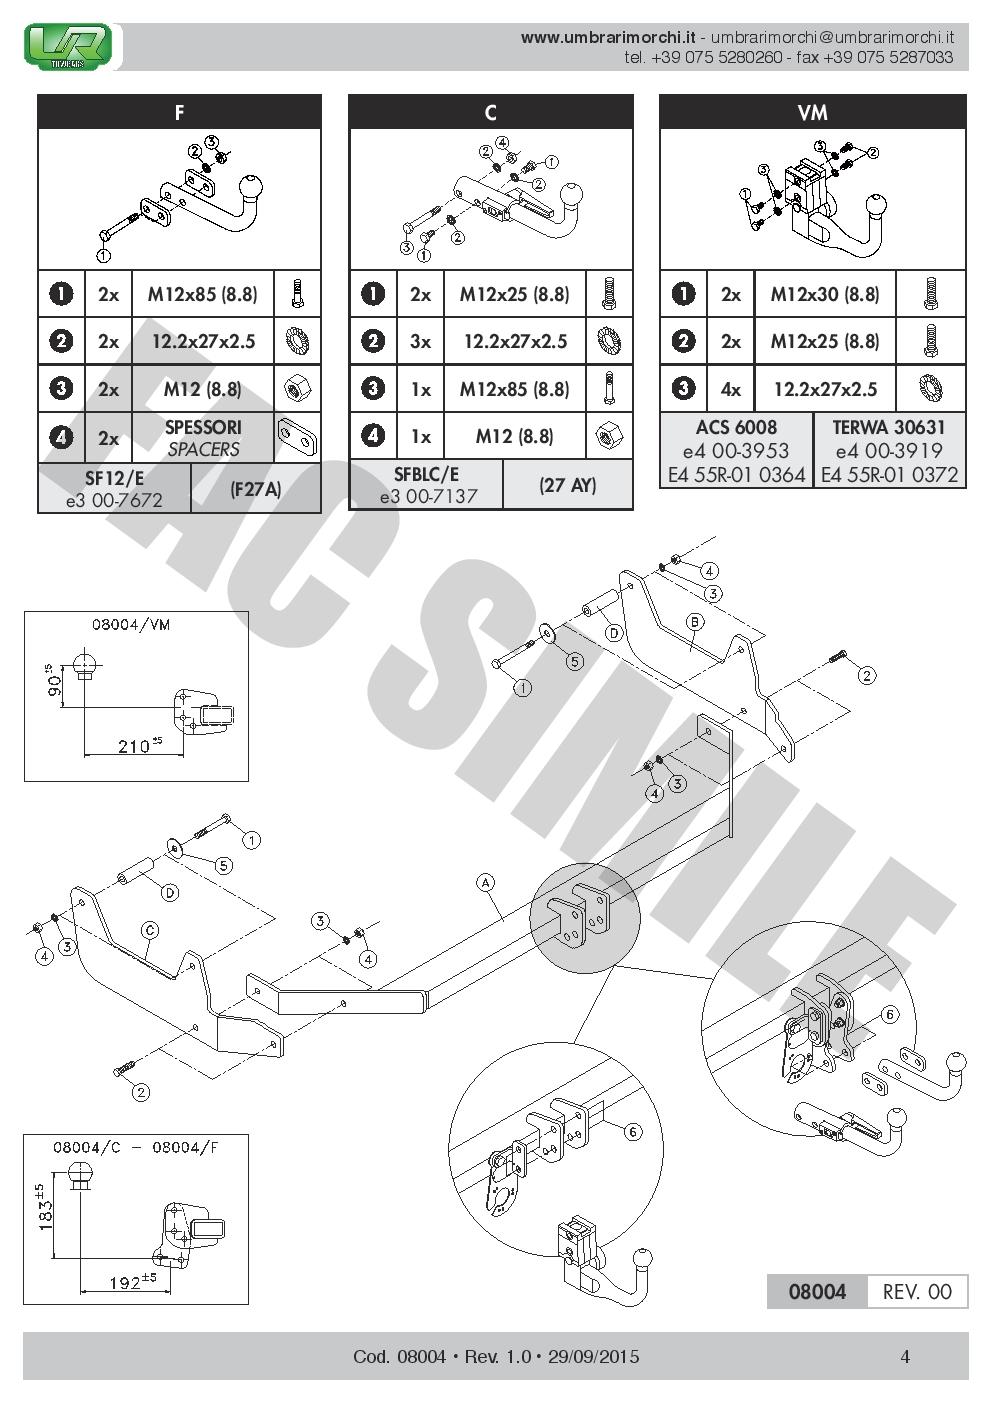 AHK Feste Starre Anhängerkupplung 7p C2 E-Satz Dacia Lodgy Kombi 12 08004//F/_B1